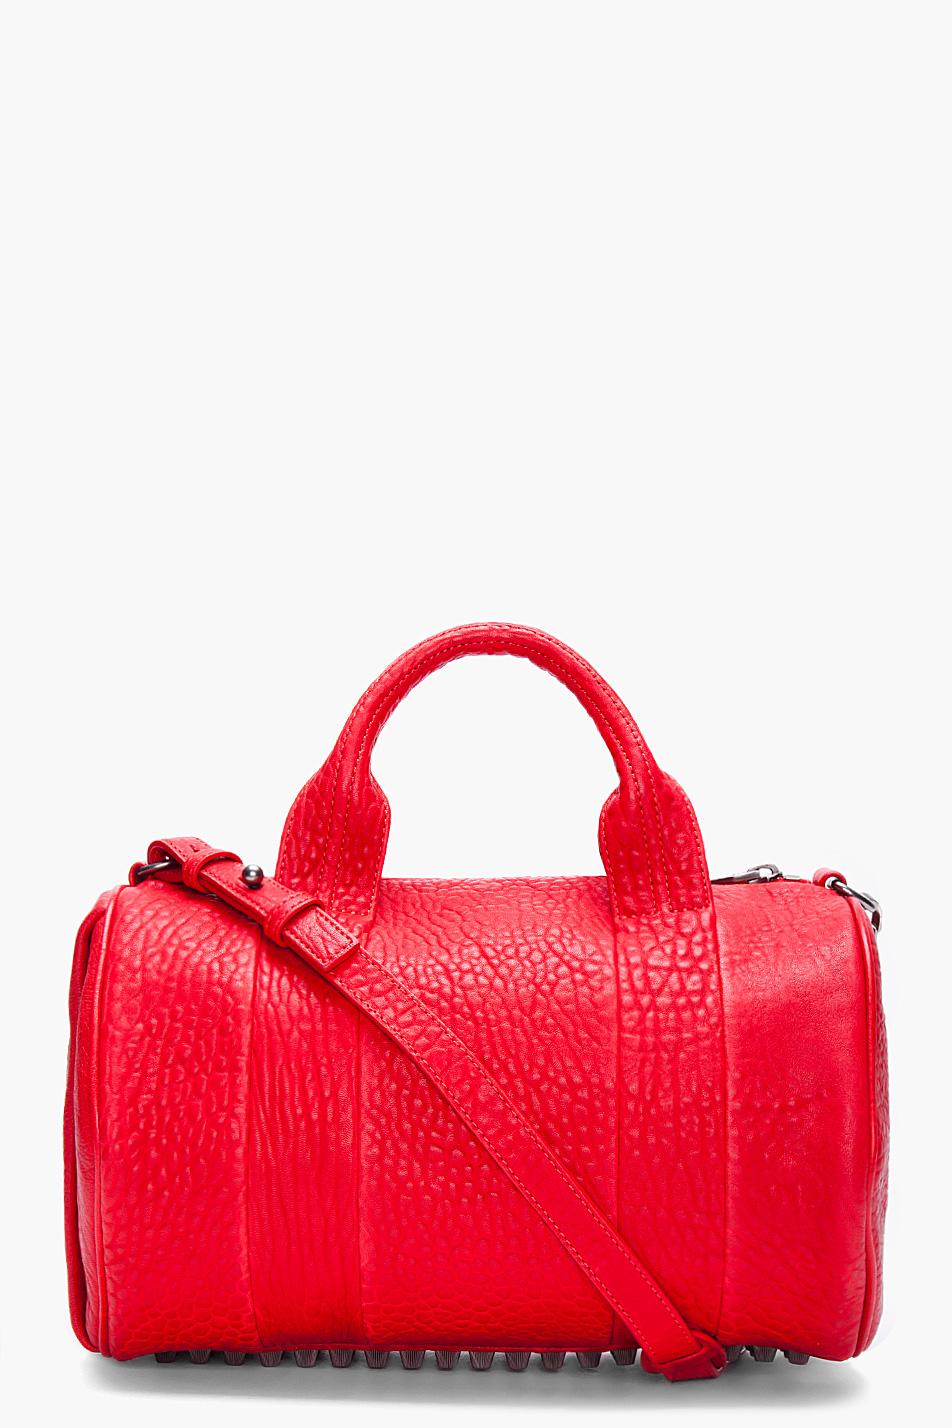 alexander wang rocco bag in red lyst. Black Bedroom Furniture Sets. Home Design Ideas